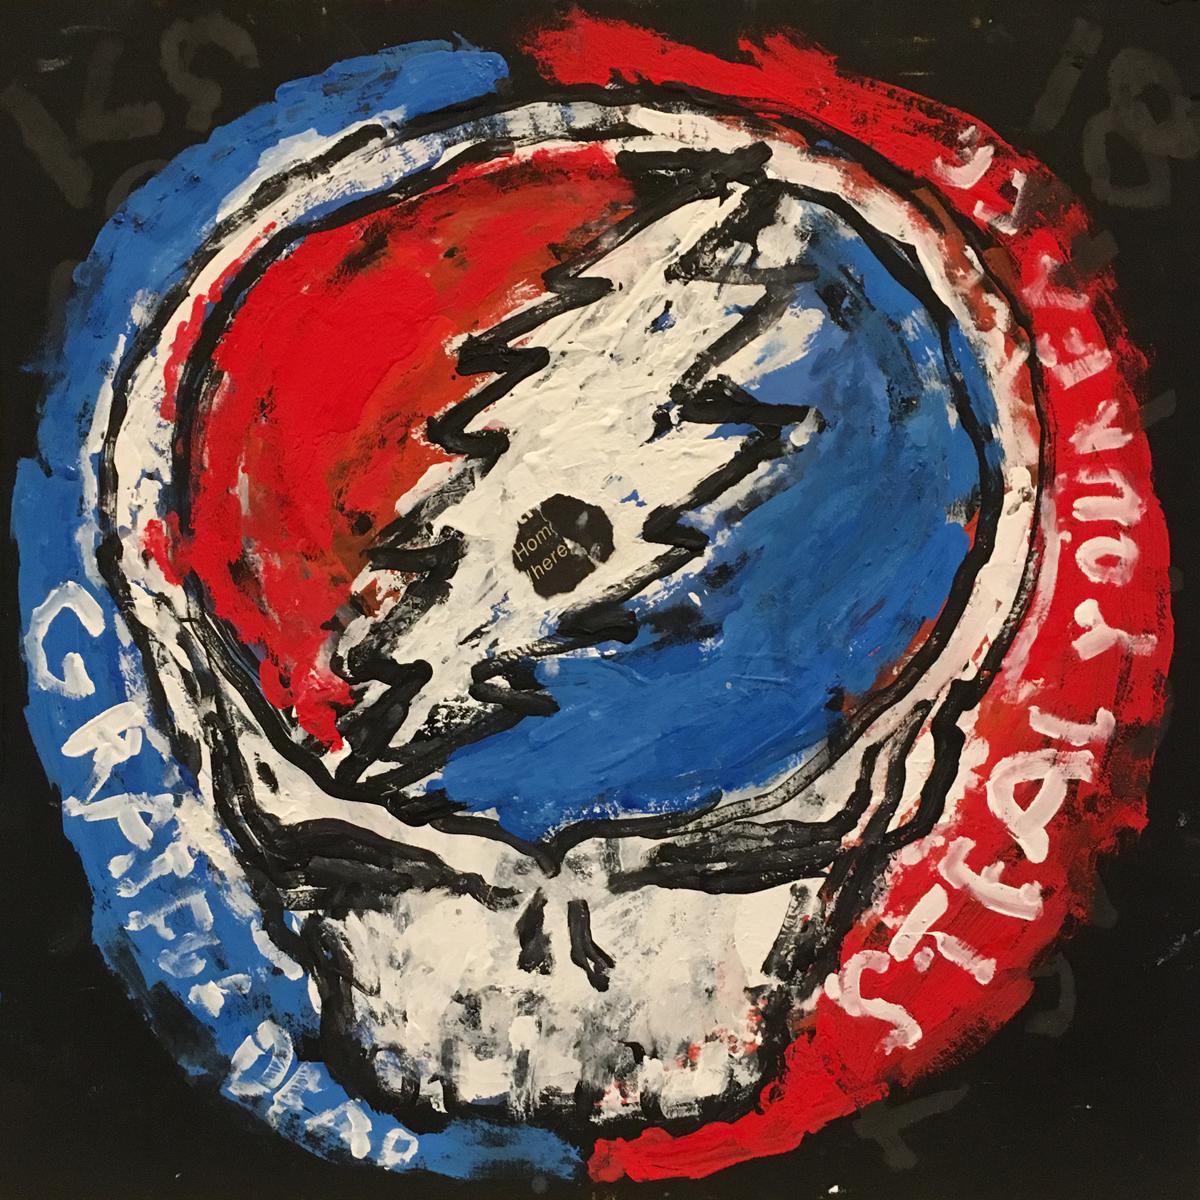 Grateful Dead / Steal your face #4